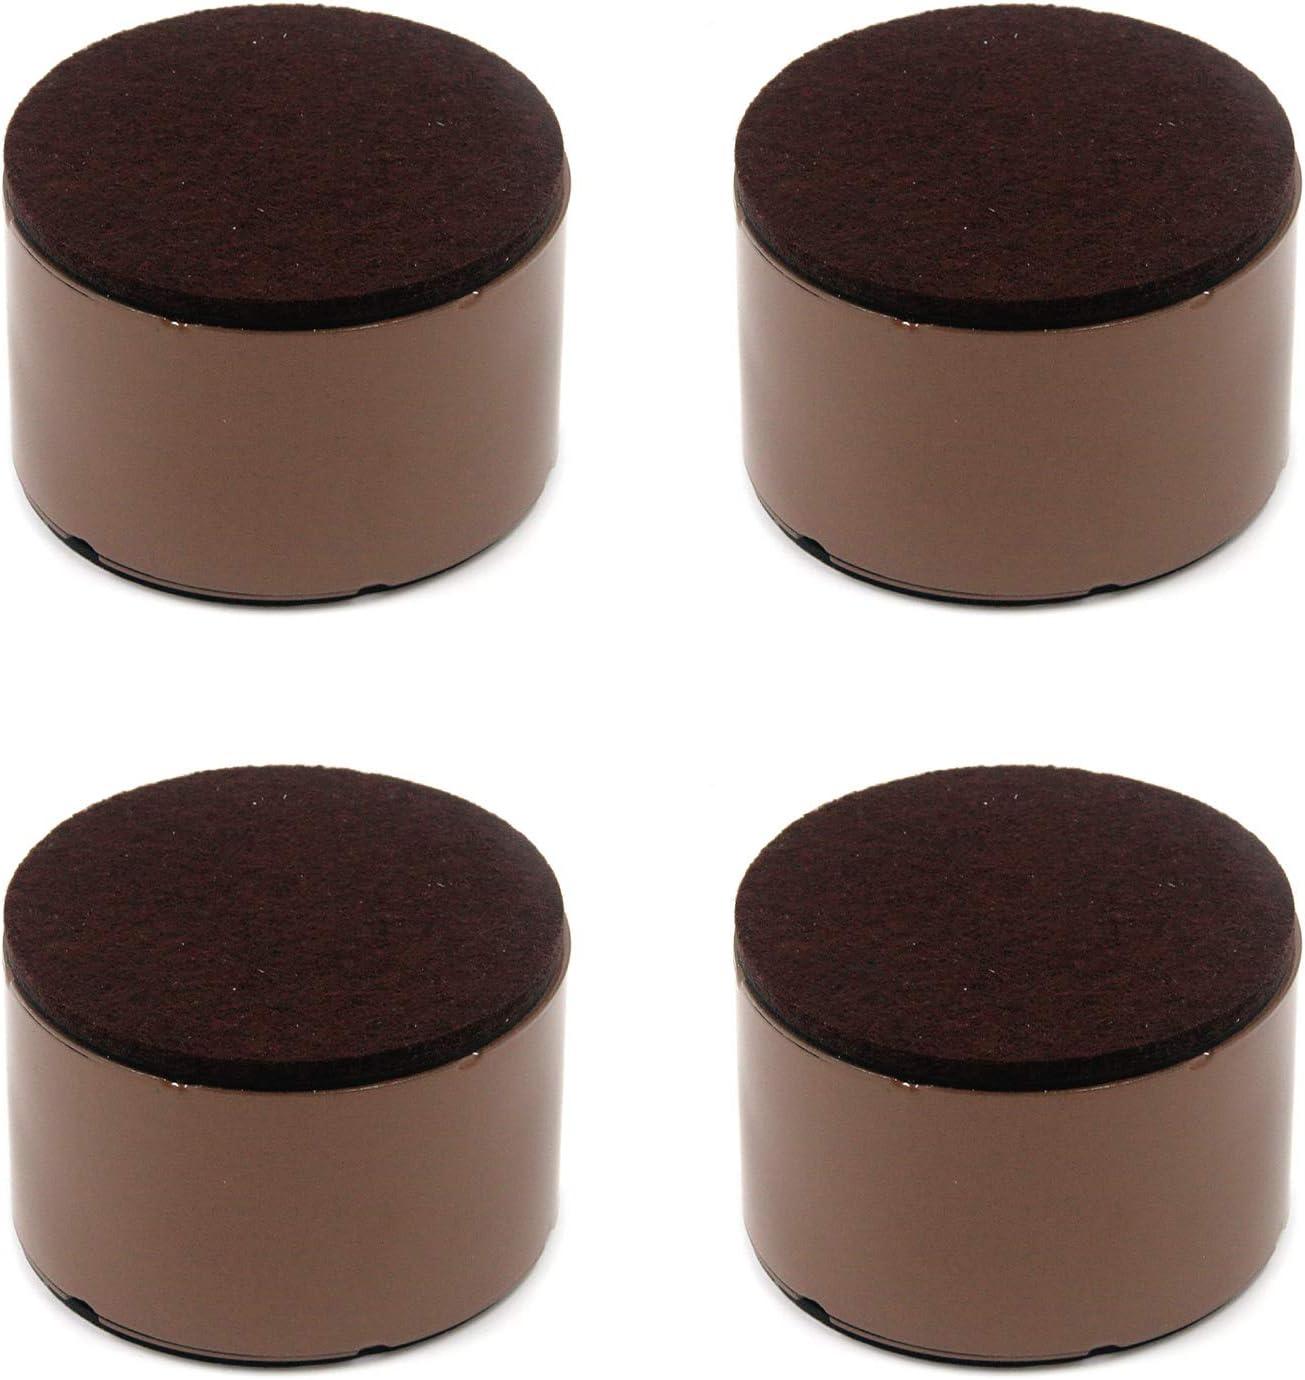 Tulead Round Furniture Risers Bed Riser Self-Adhesive Table Desk Riser Block Cabinet Post 3.15